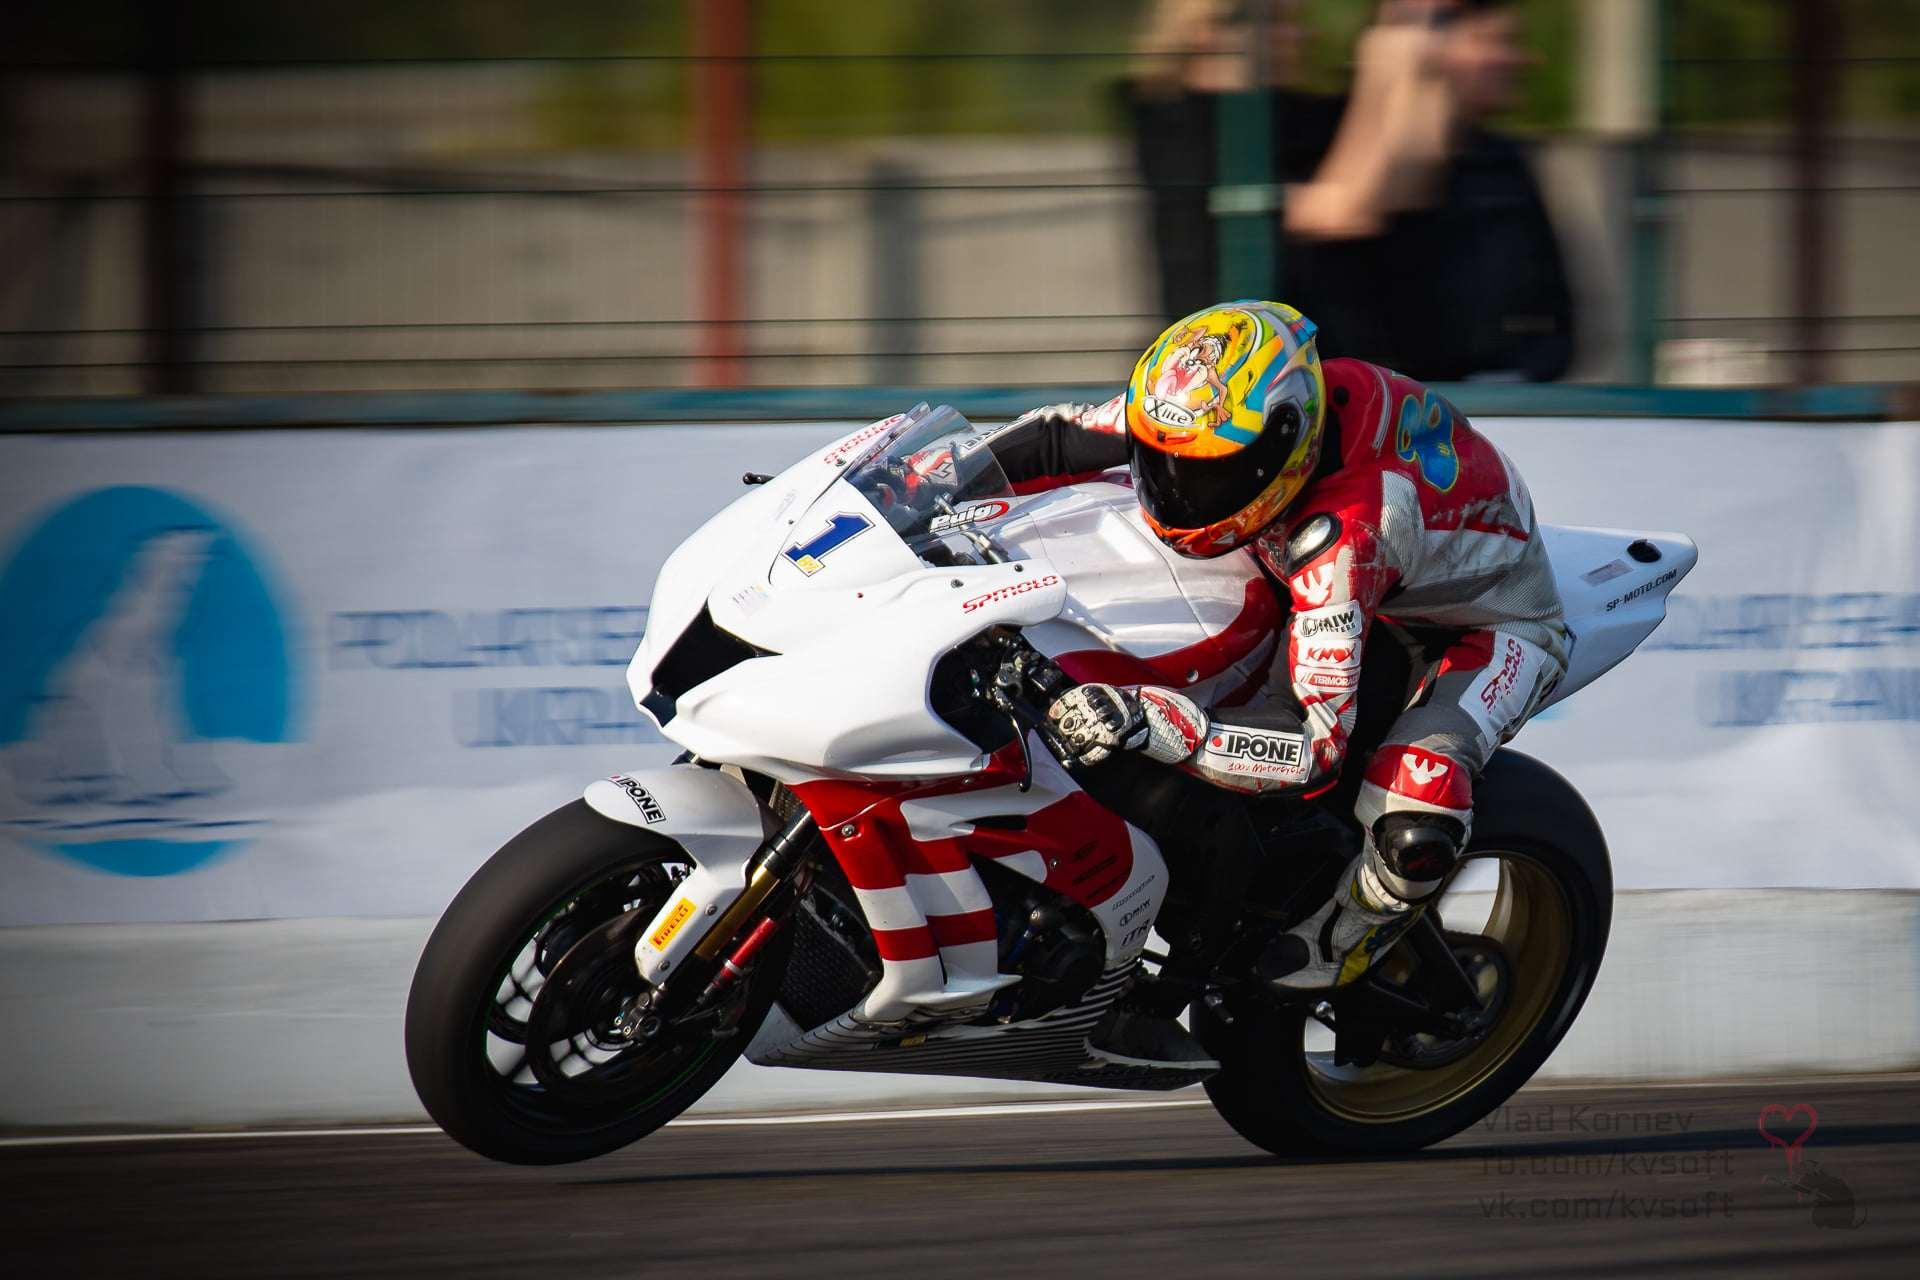 5-6_etap_MotoGPUkraine_072